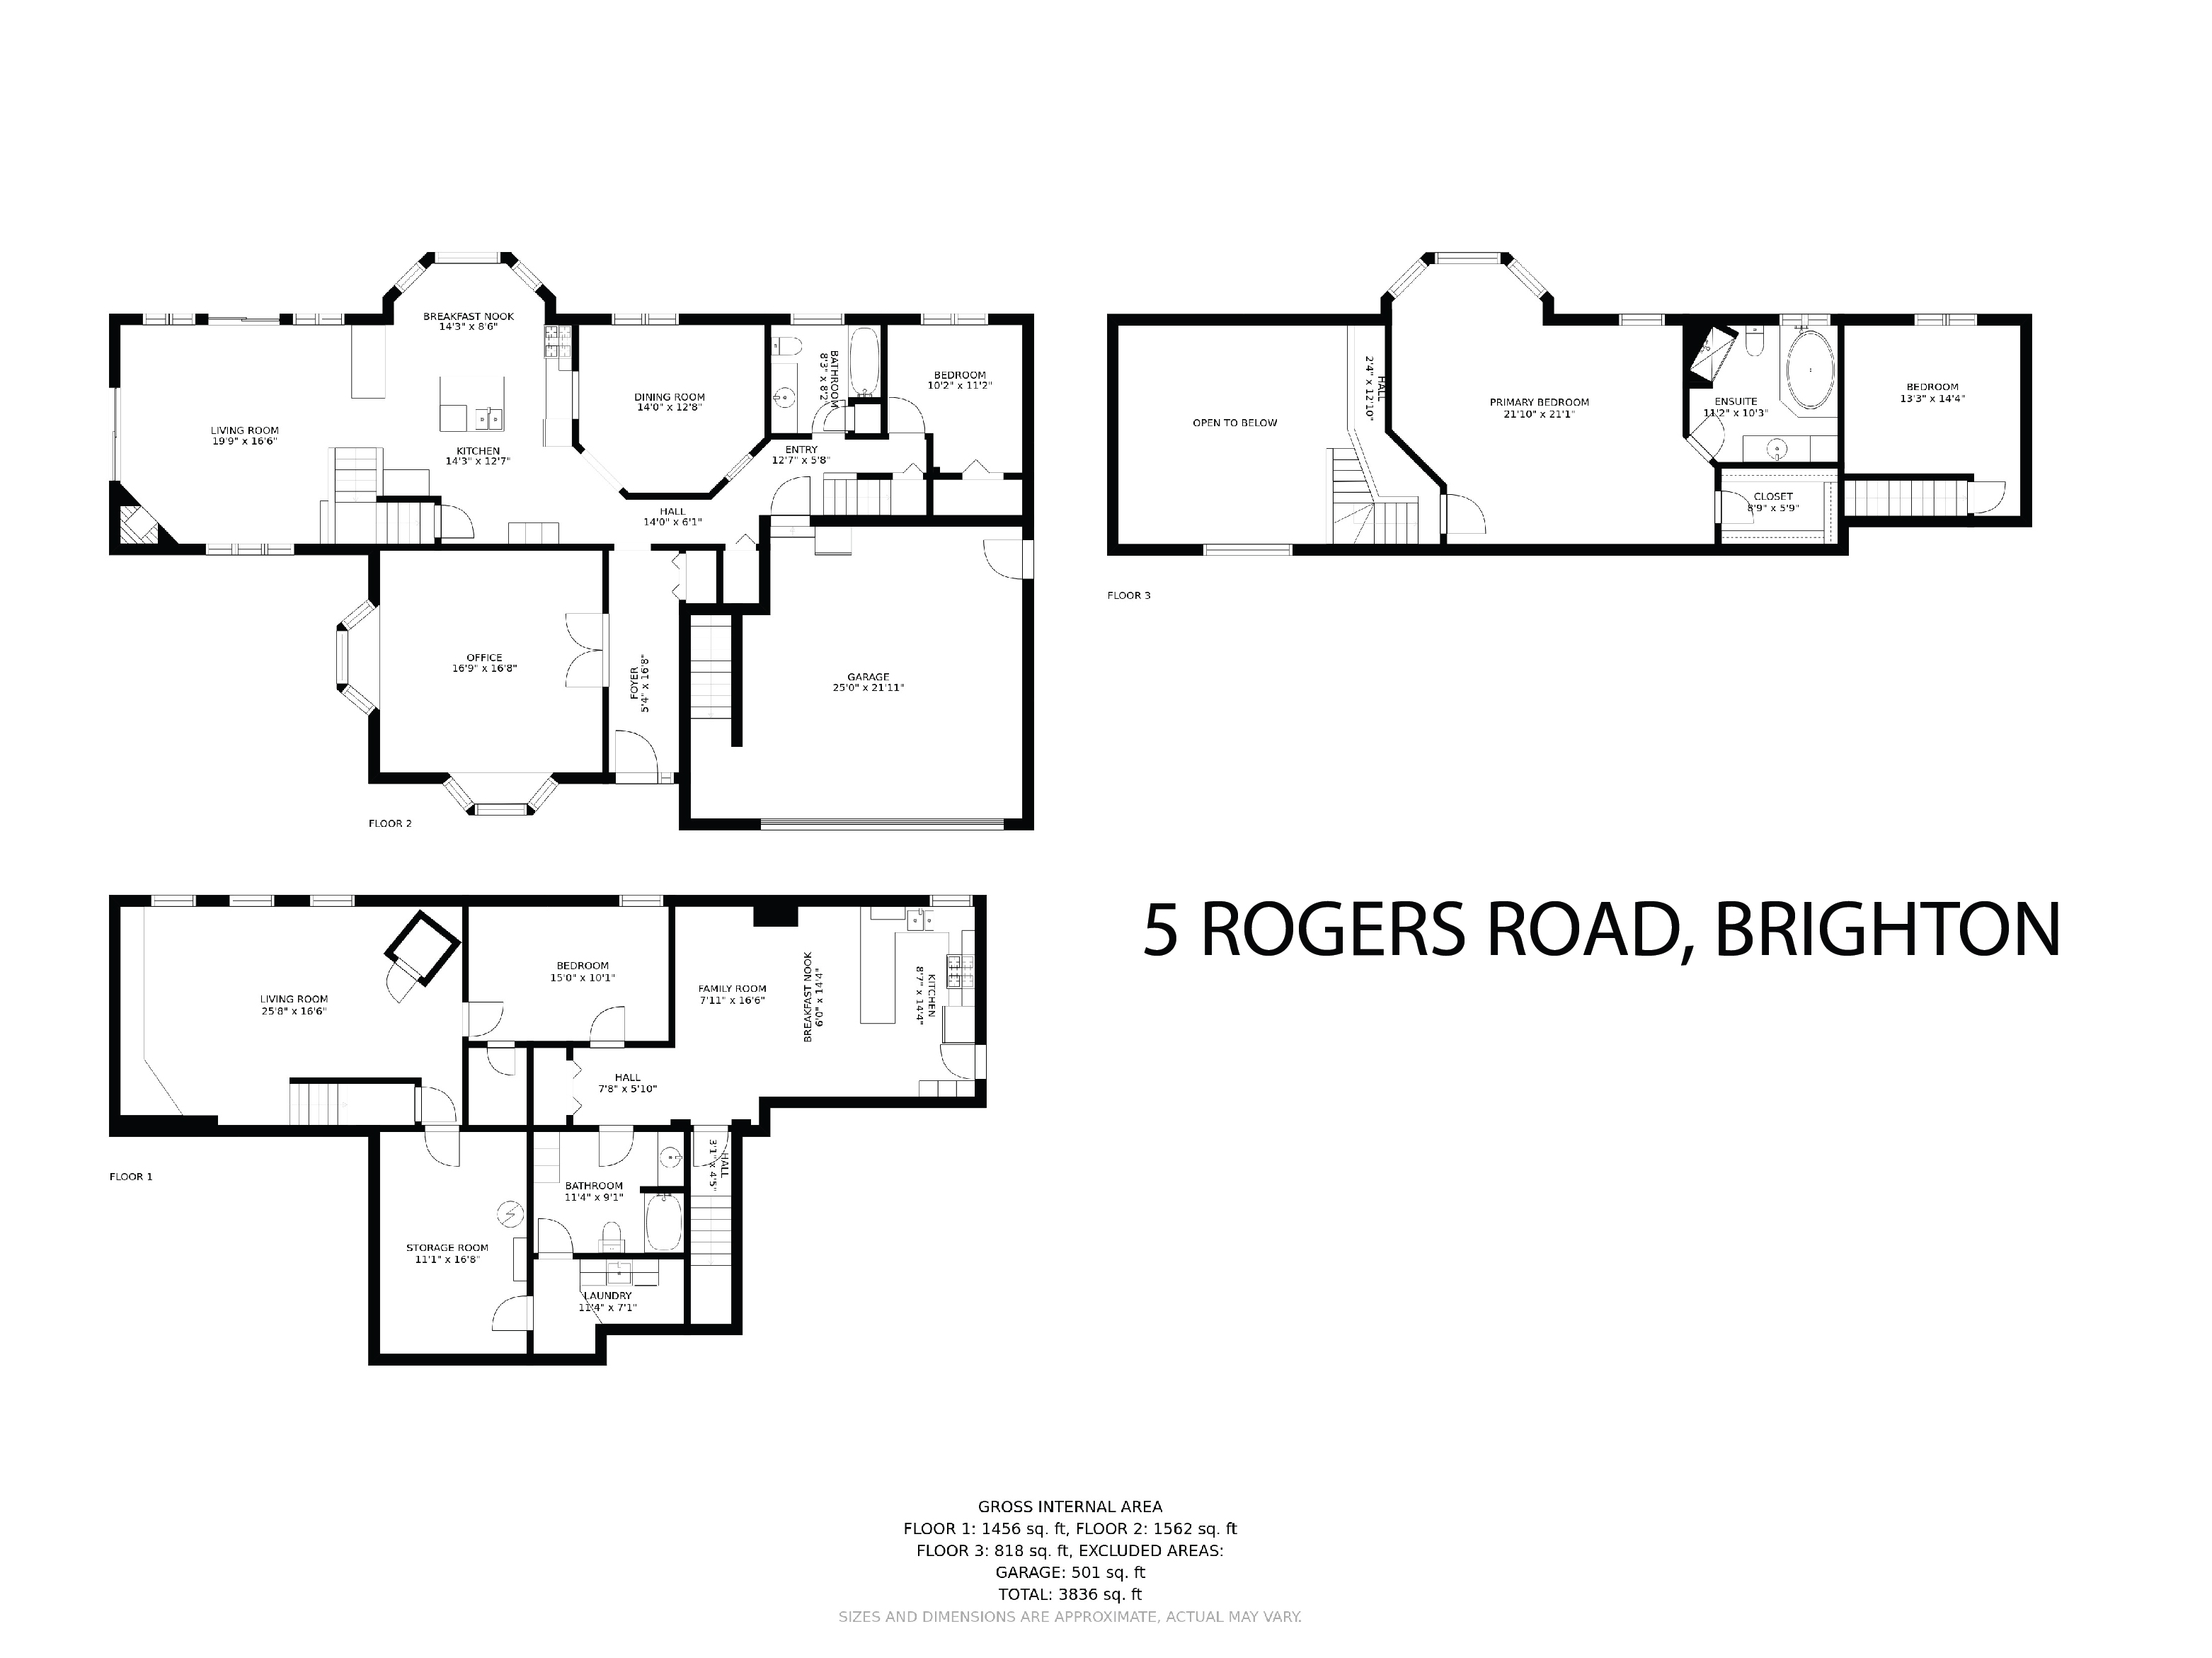 5 Rogers Road floorplan